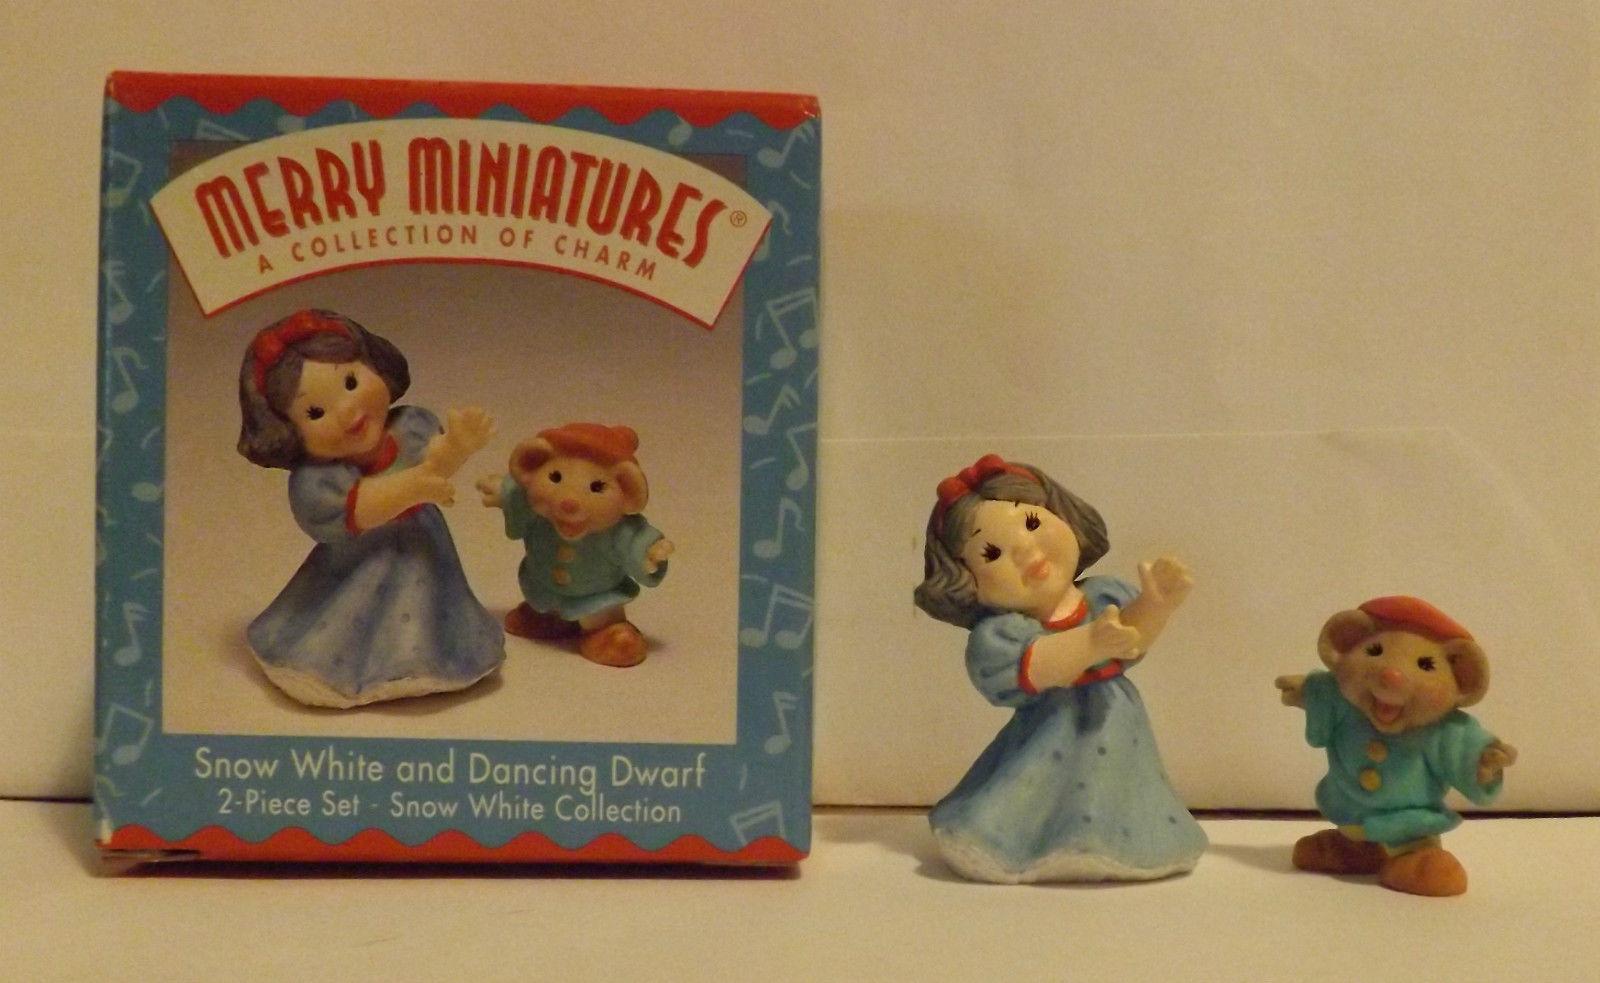 Hallmark Merry Miniatures Snow White and Dancing Dwarf 2-Piece Set 1997